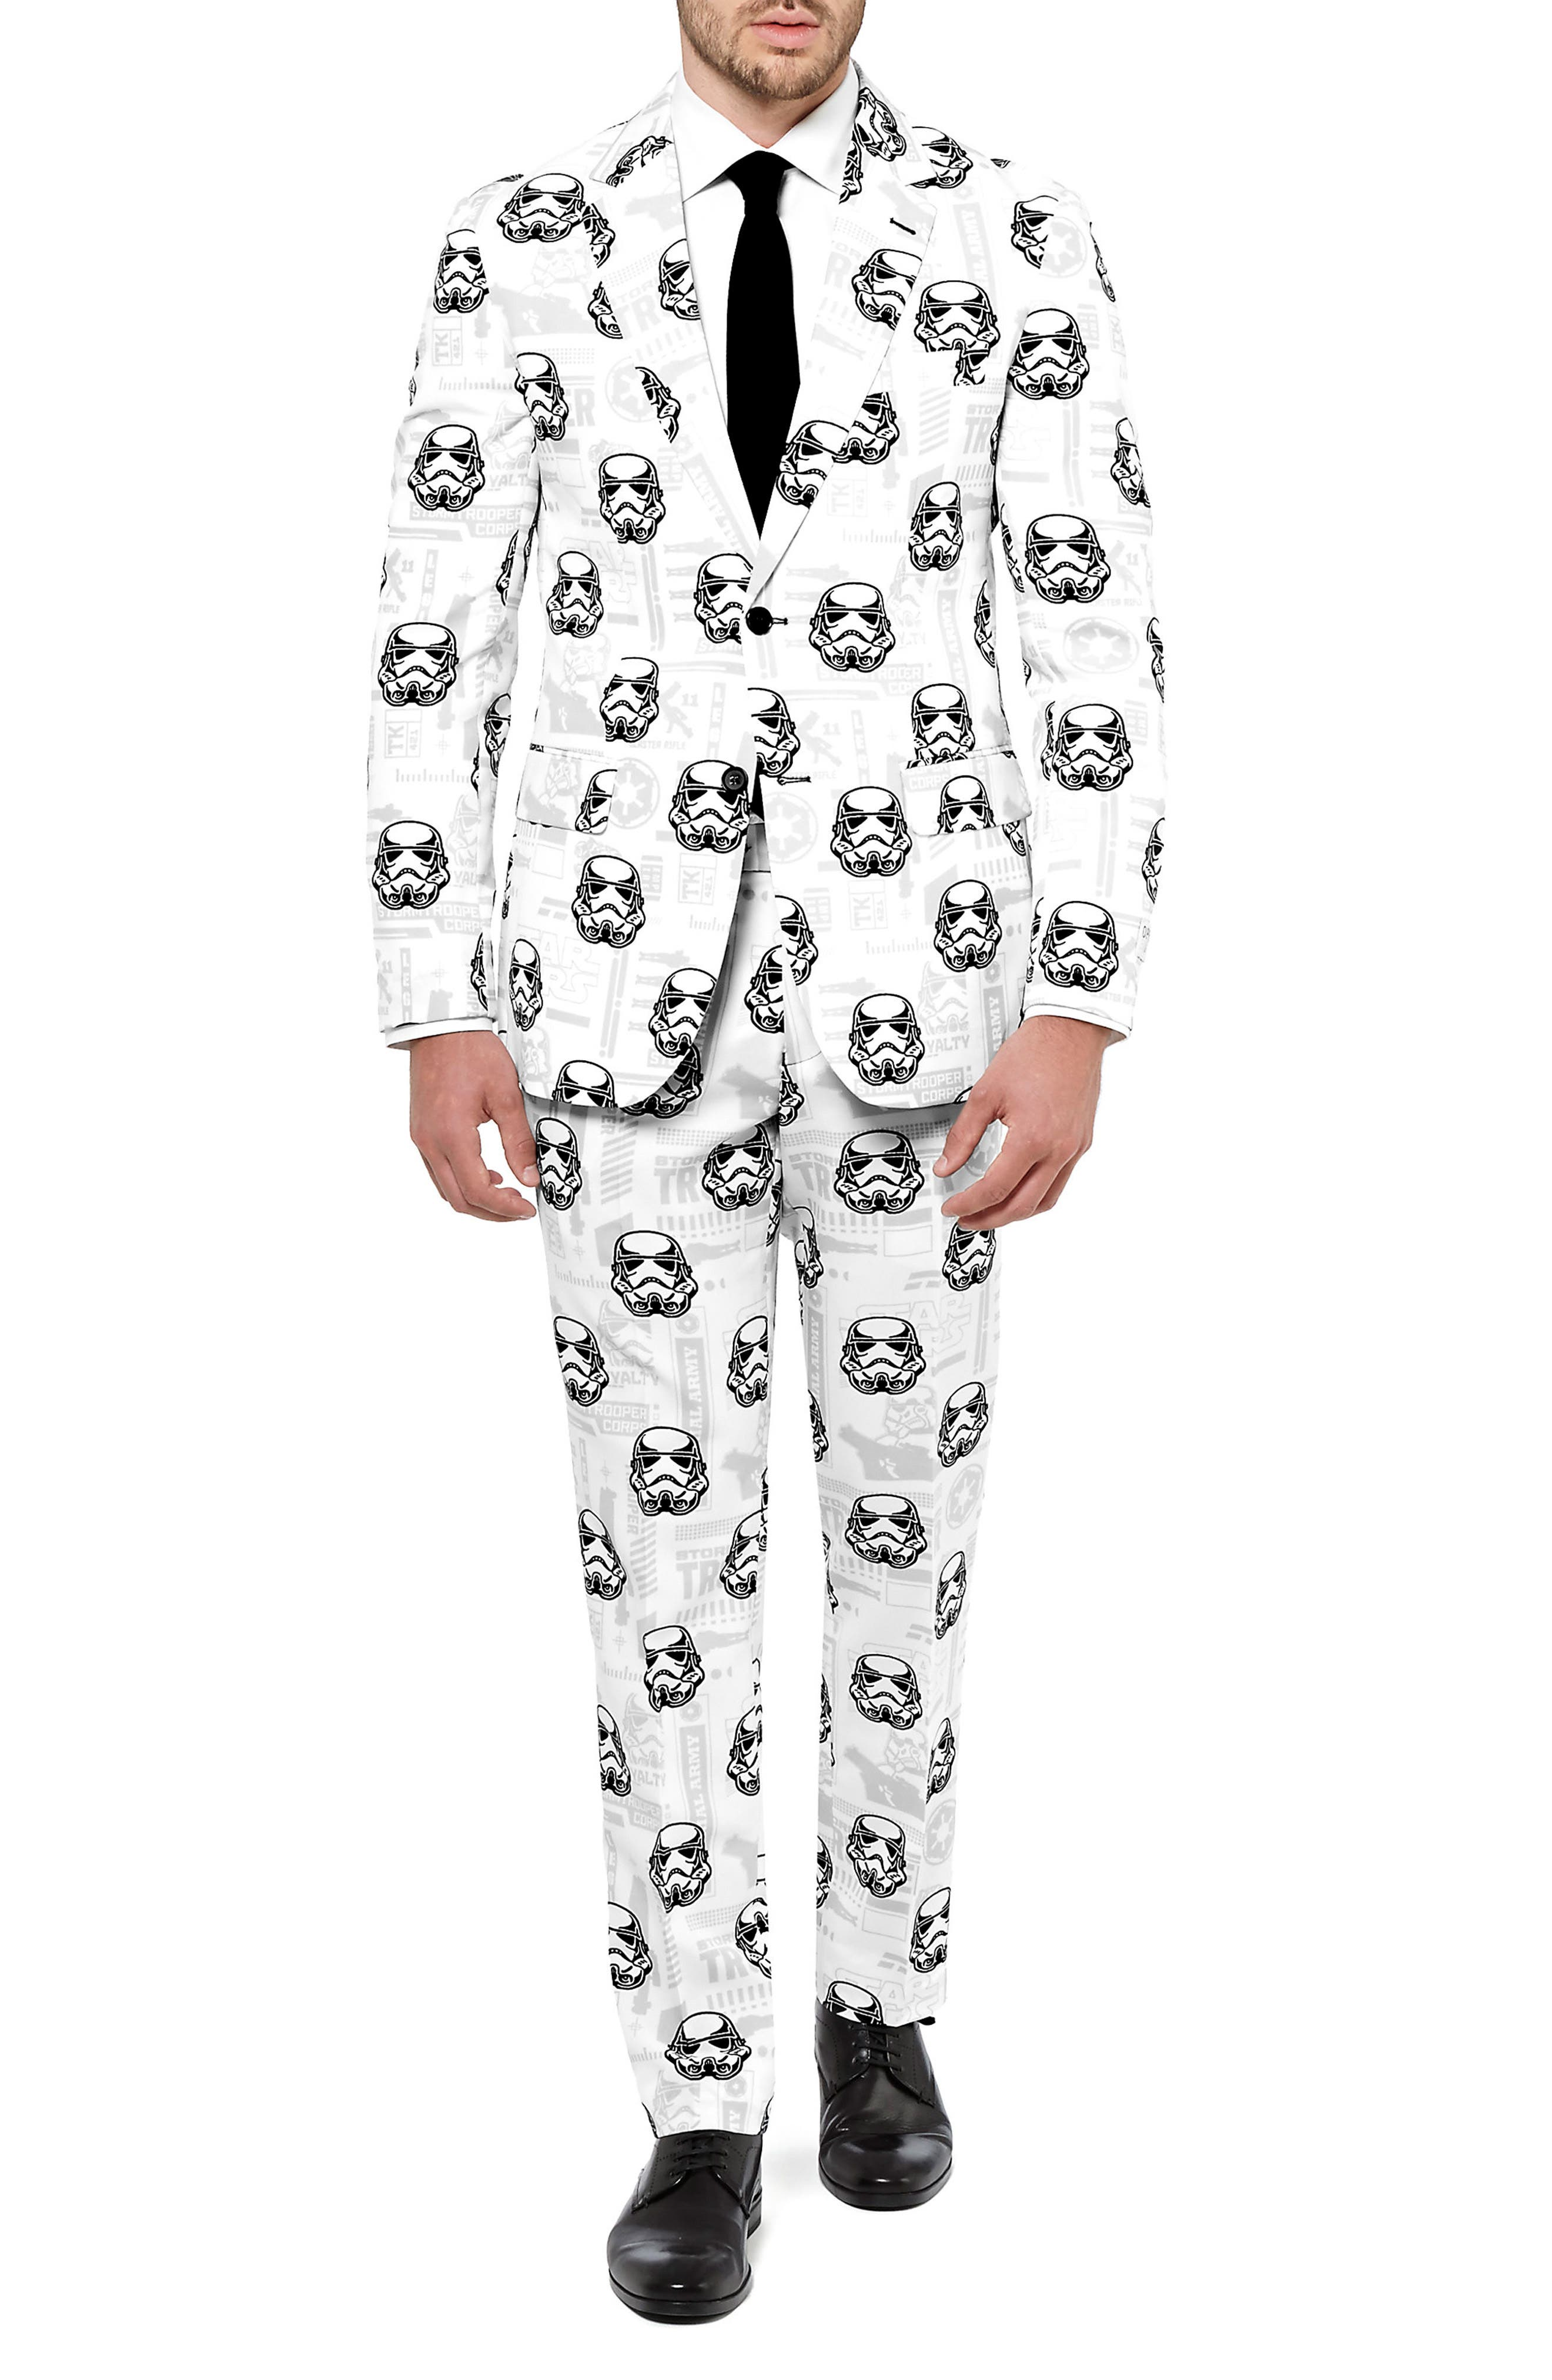 Stormtrooper Trim Fit Two-Piece Suit with Tie,                             Alternate thumbnail 4, color,